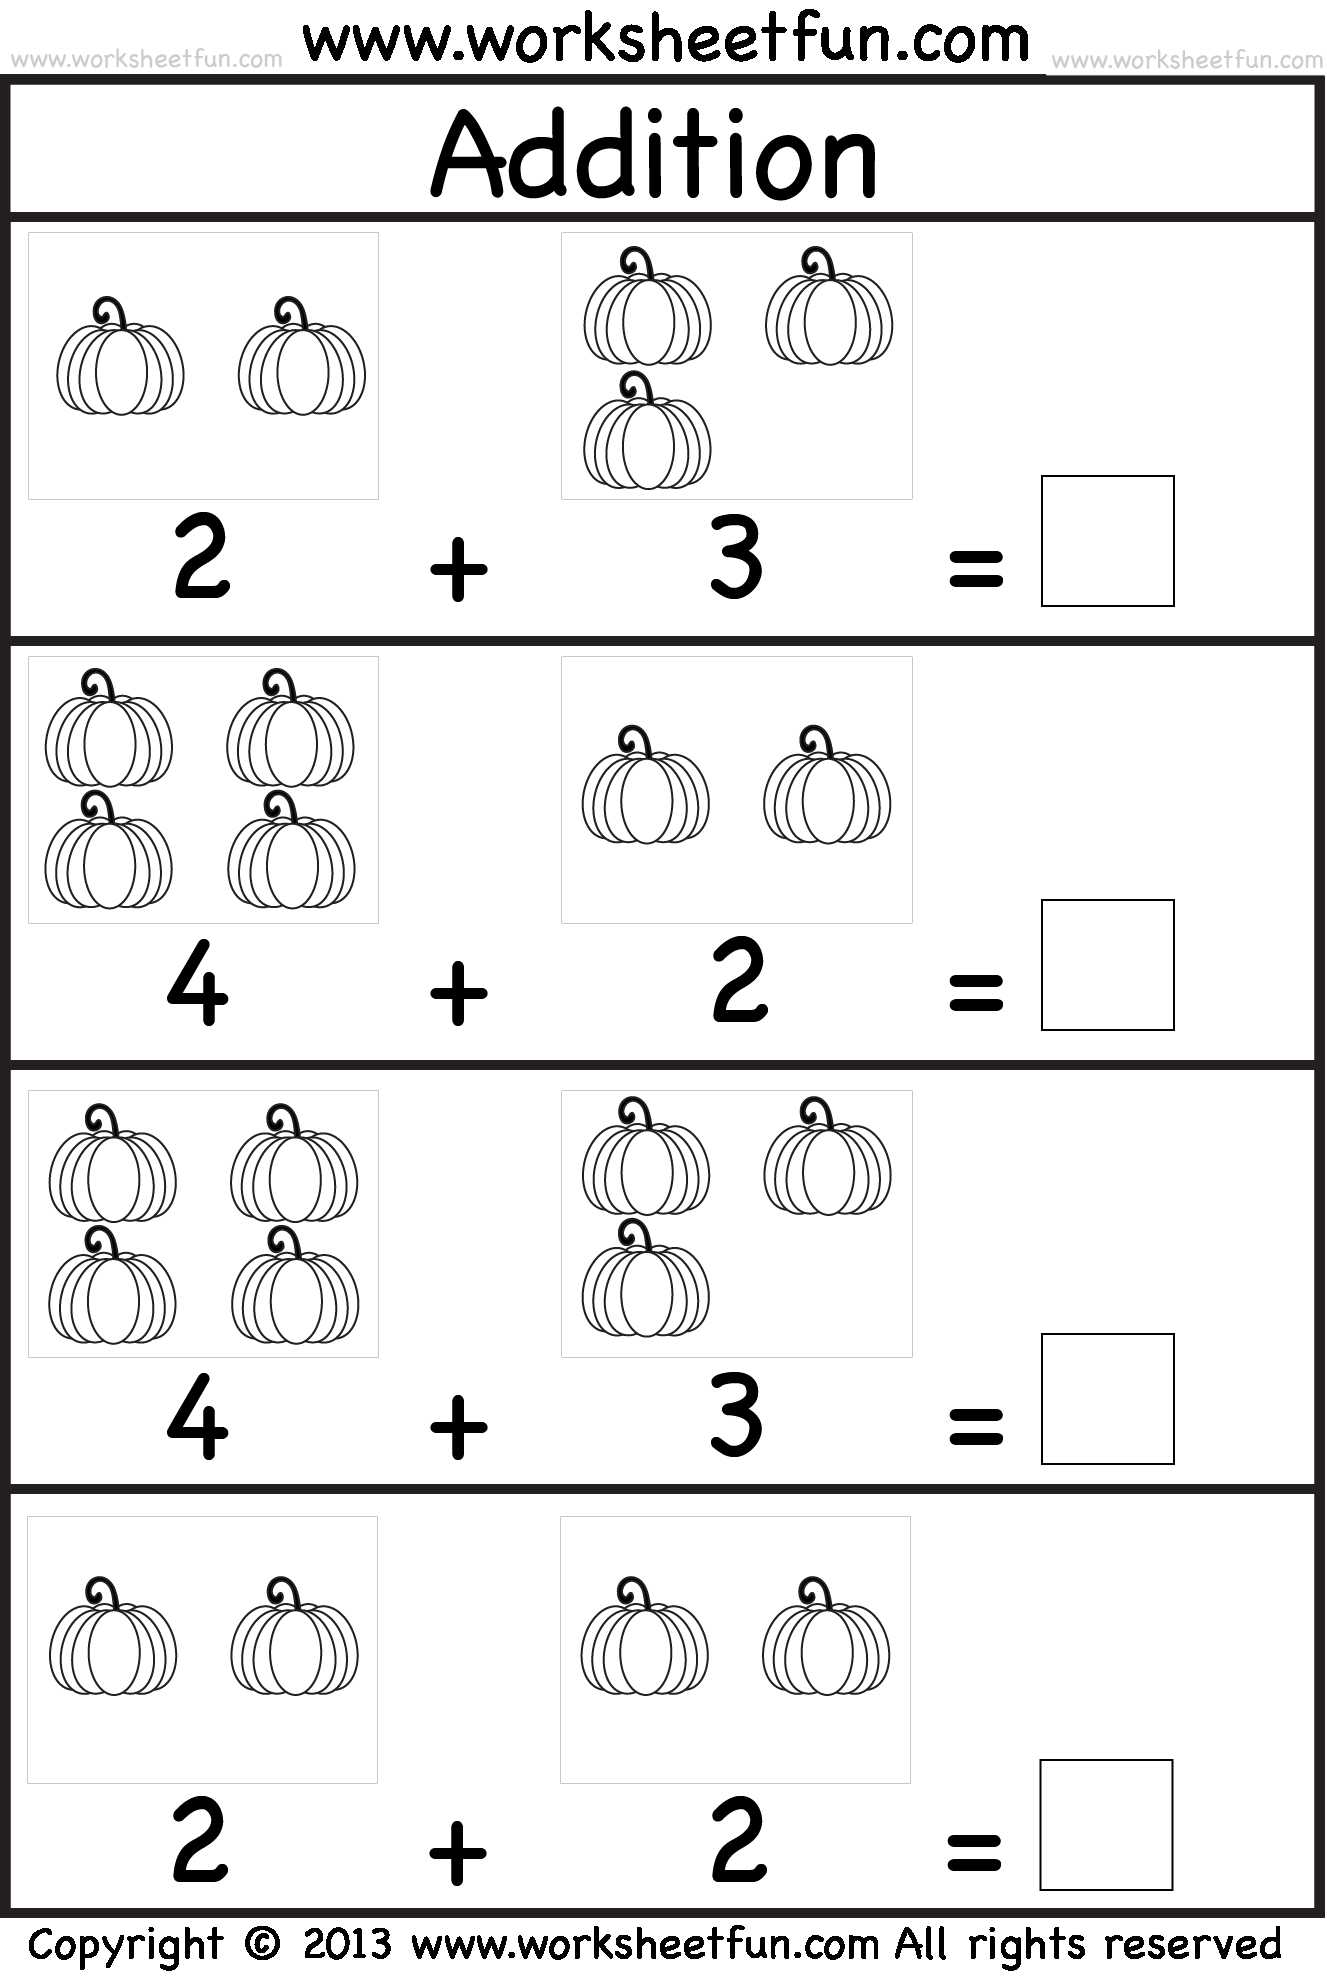 Sentence Building Worksheets For Kindergarten As Well As